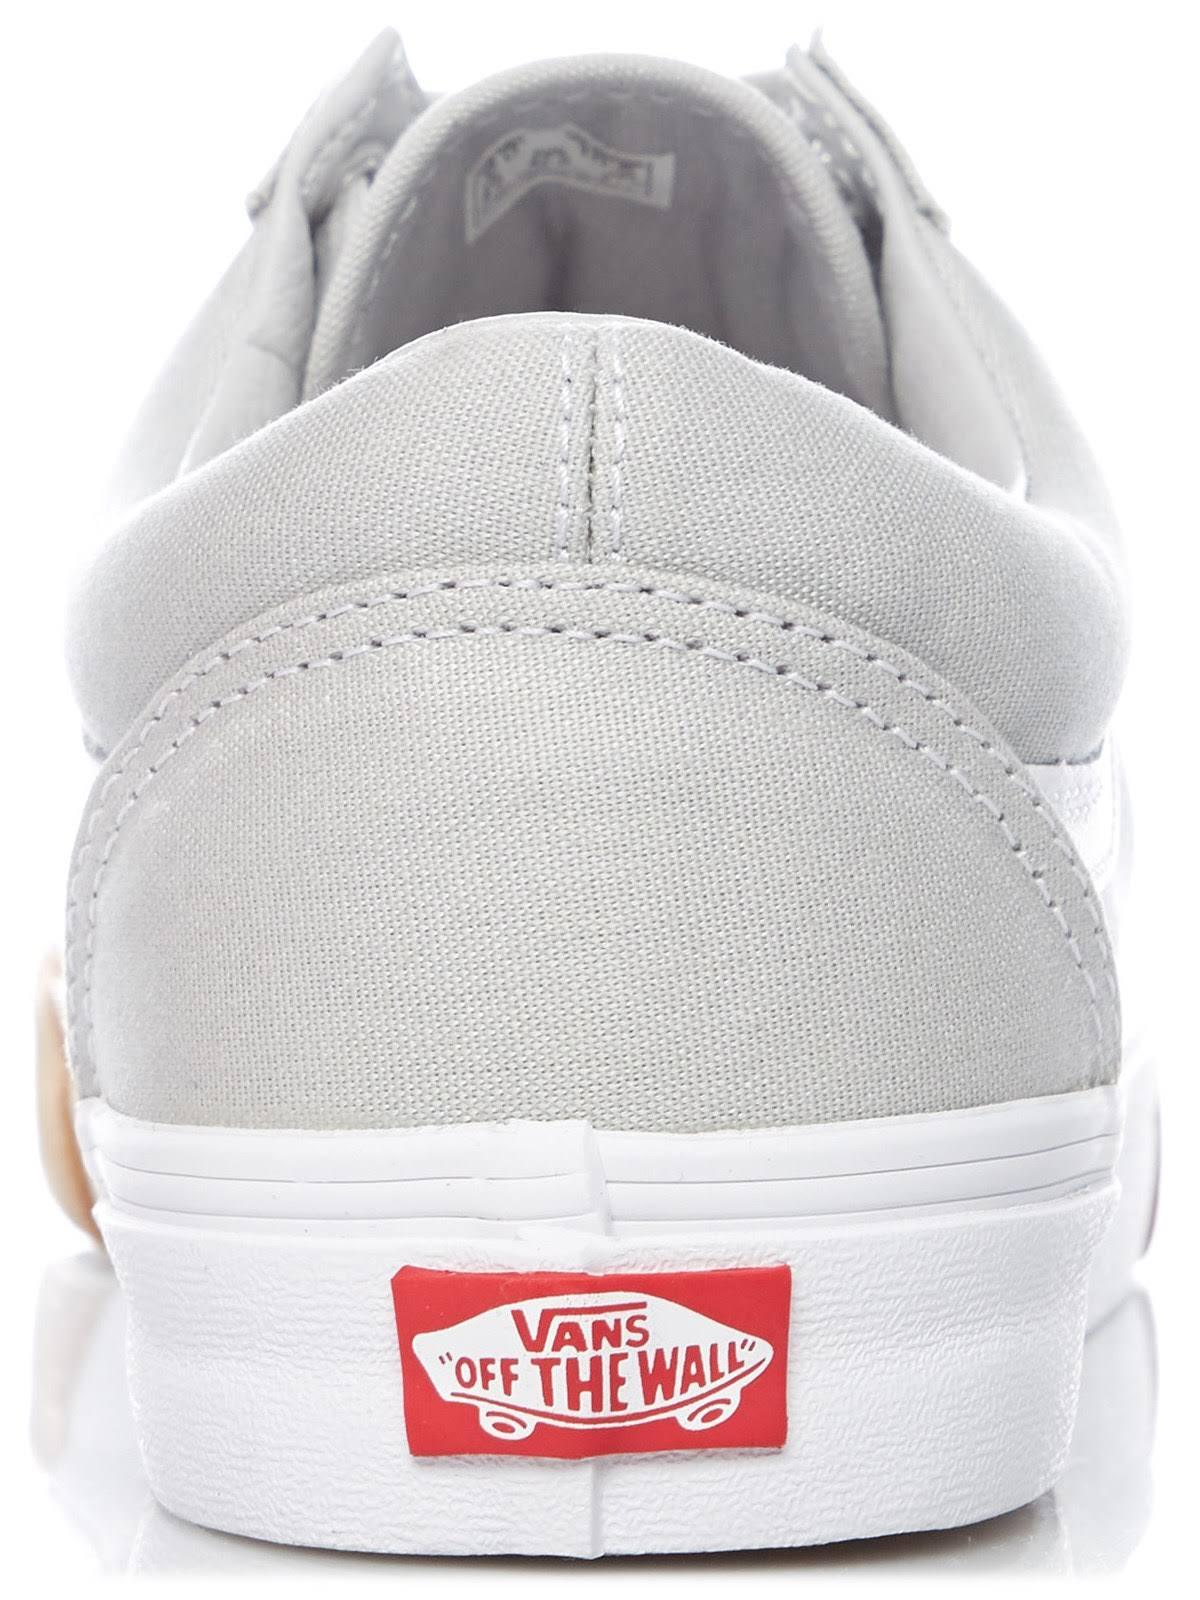 White BumperGlacier GreyTrue Old SkoolGum Vans fyYbv7g6